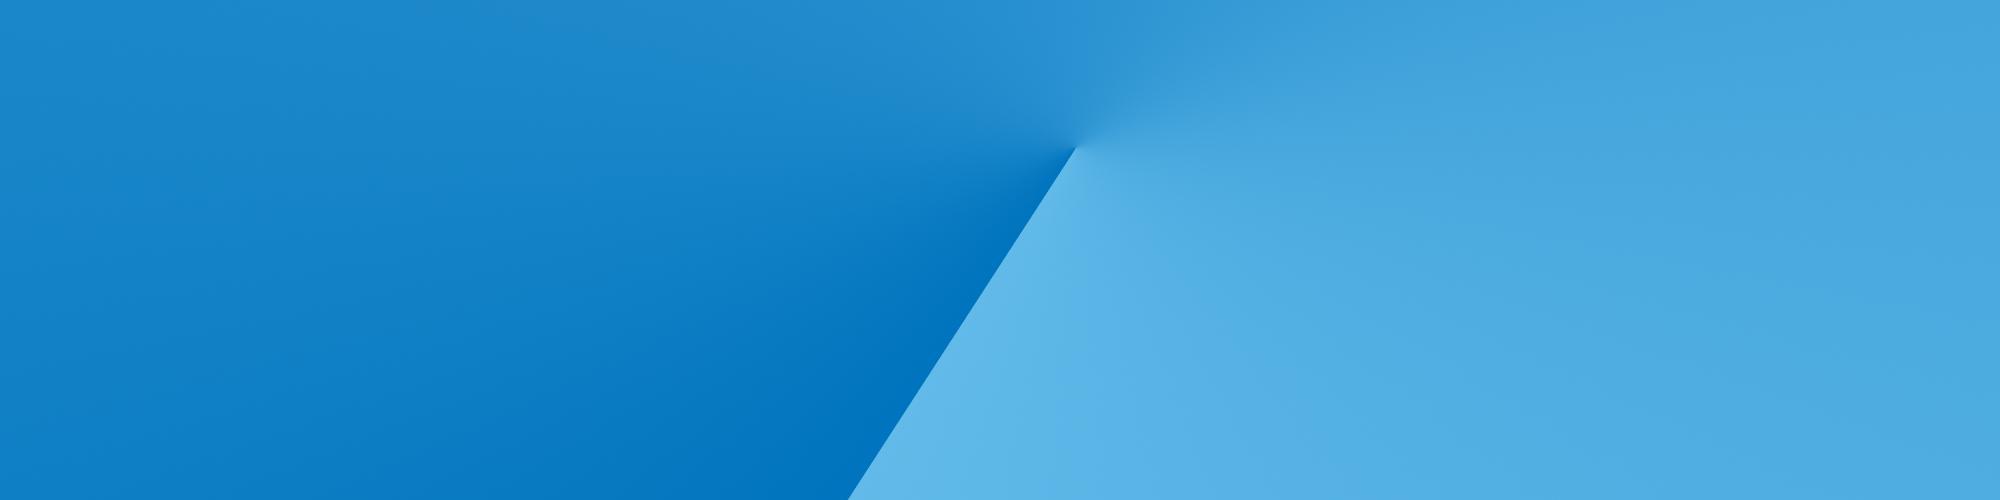 Abstract Blue Angular gradient hero